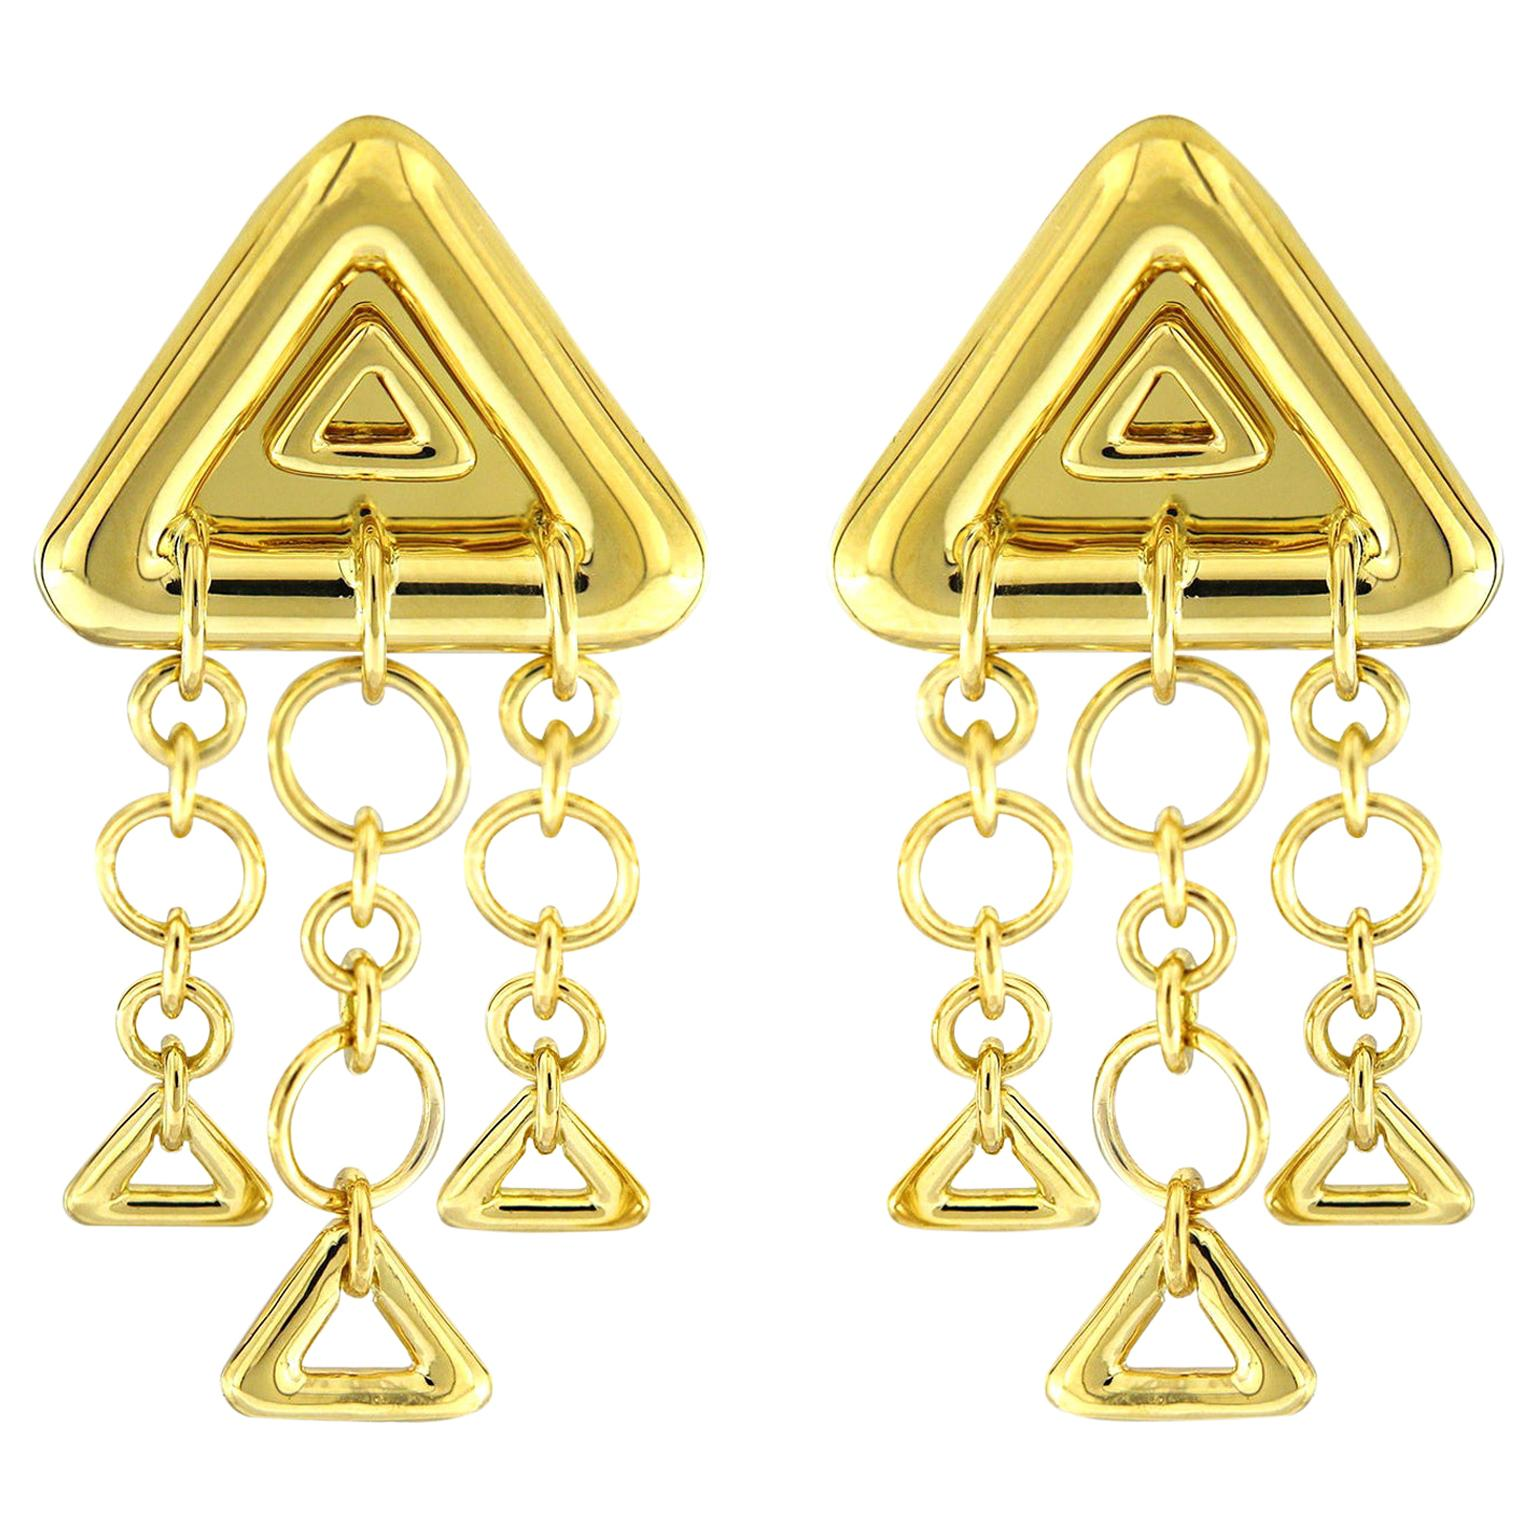 Valentin Magro 18 Karat Yellow Gold Triangular Earrings